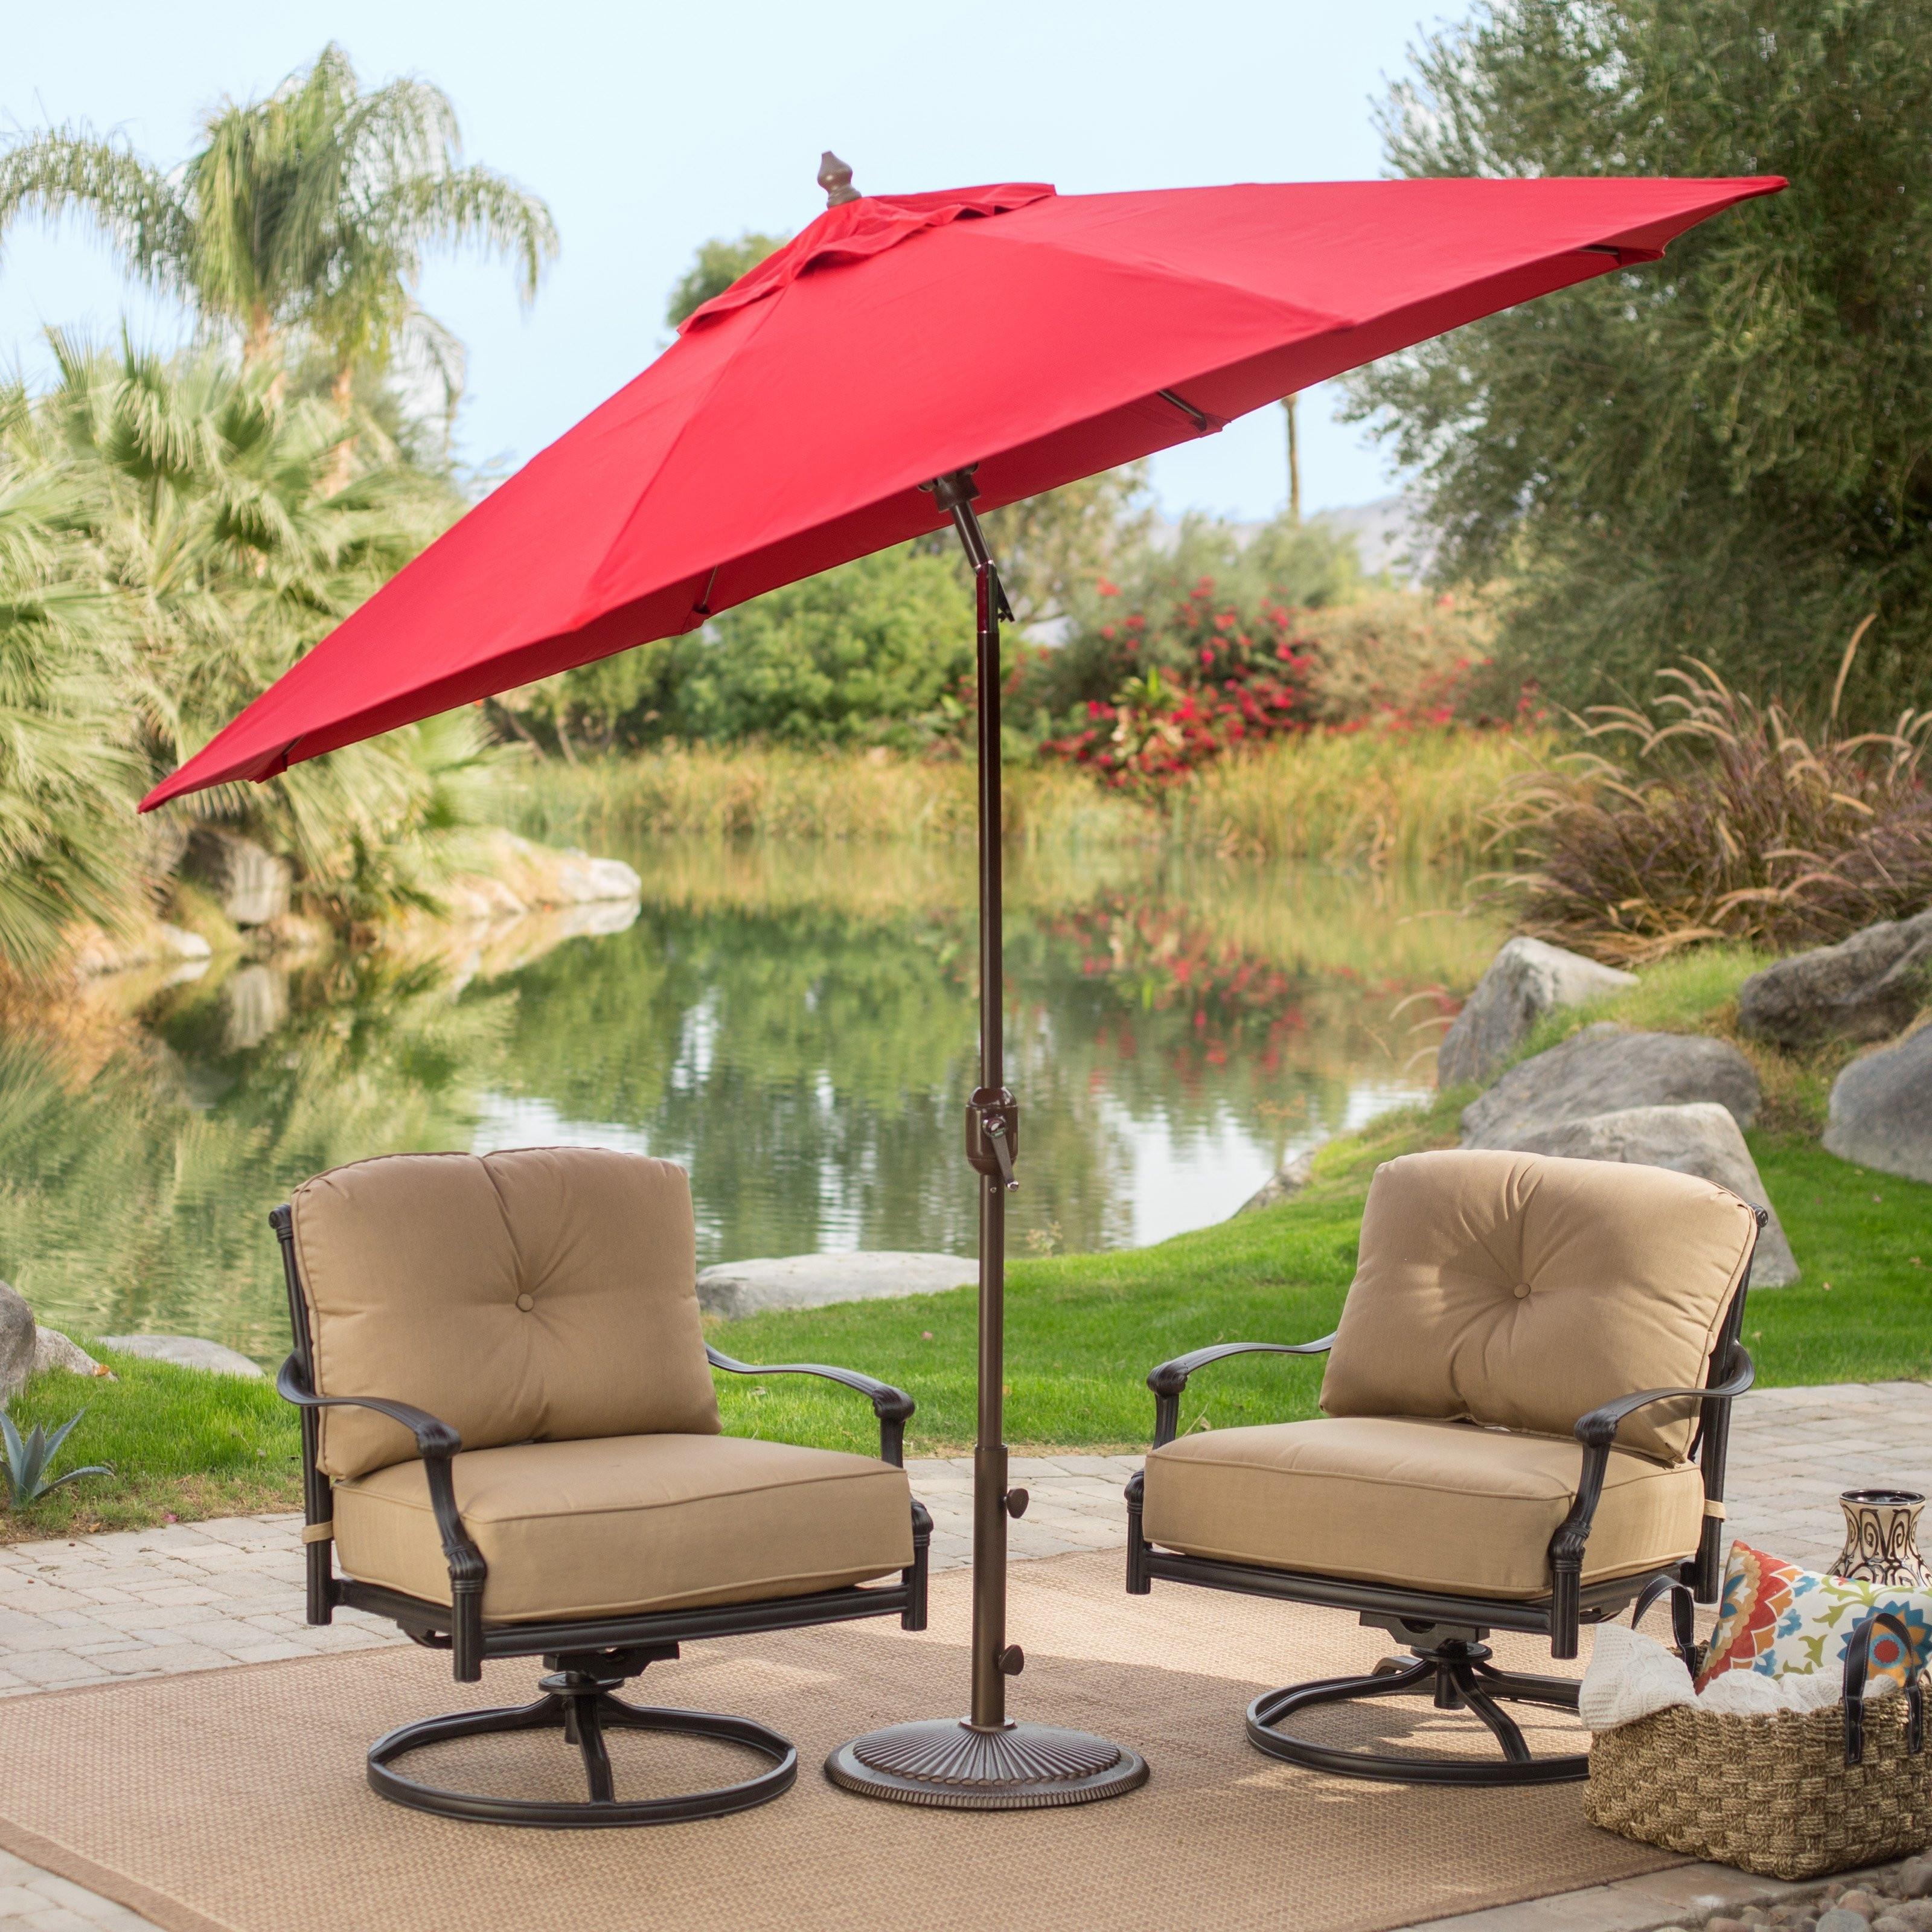 Most Up To Date Tilting Patio Umbrellas For Sunbrella Patio Umbrellas Coral Coast 9 Ft Deluxe Tilt Aluminum (View 12 of 20)